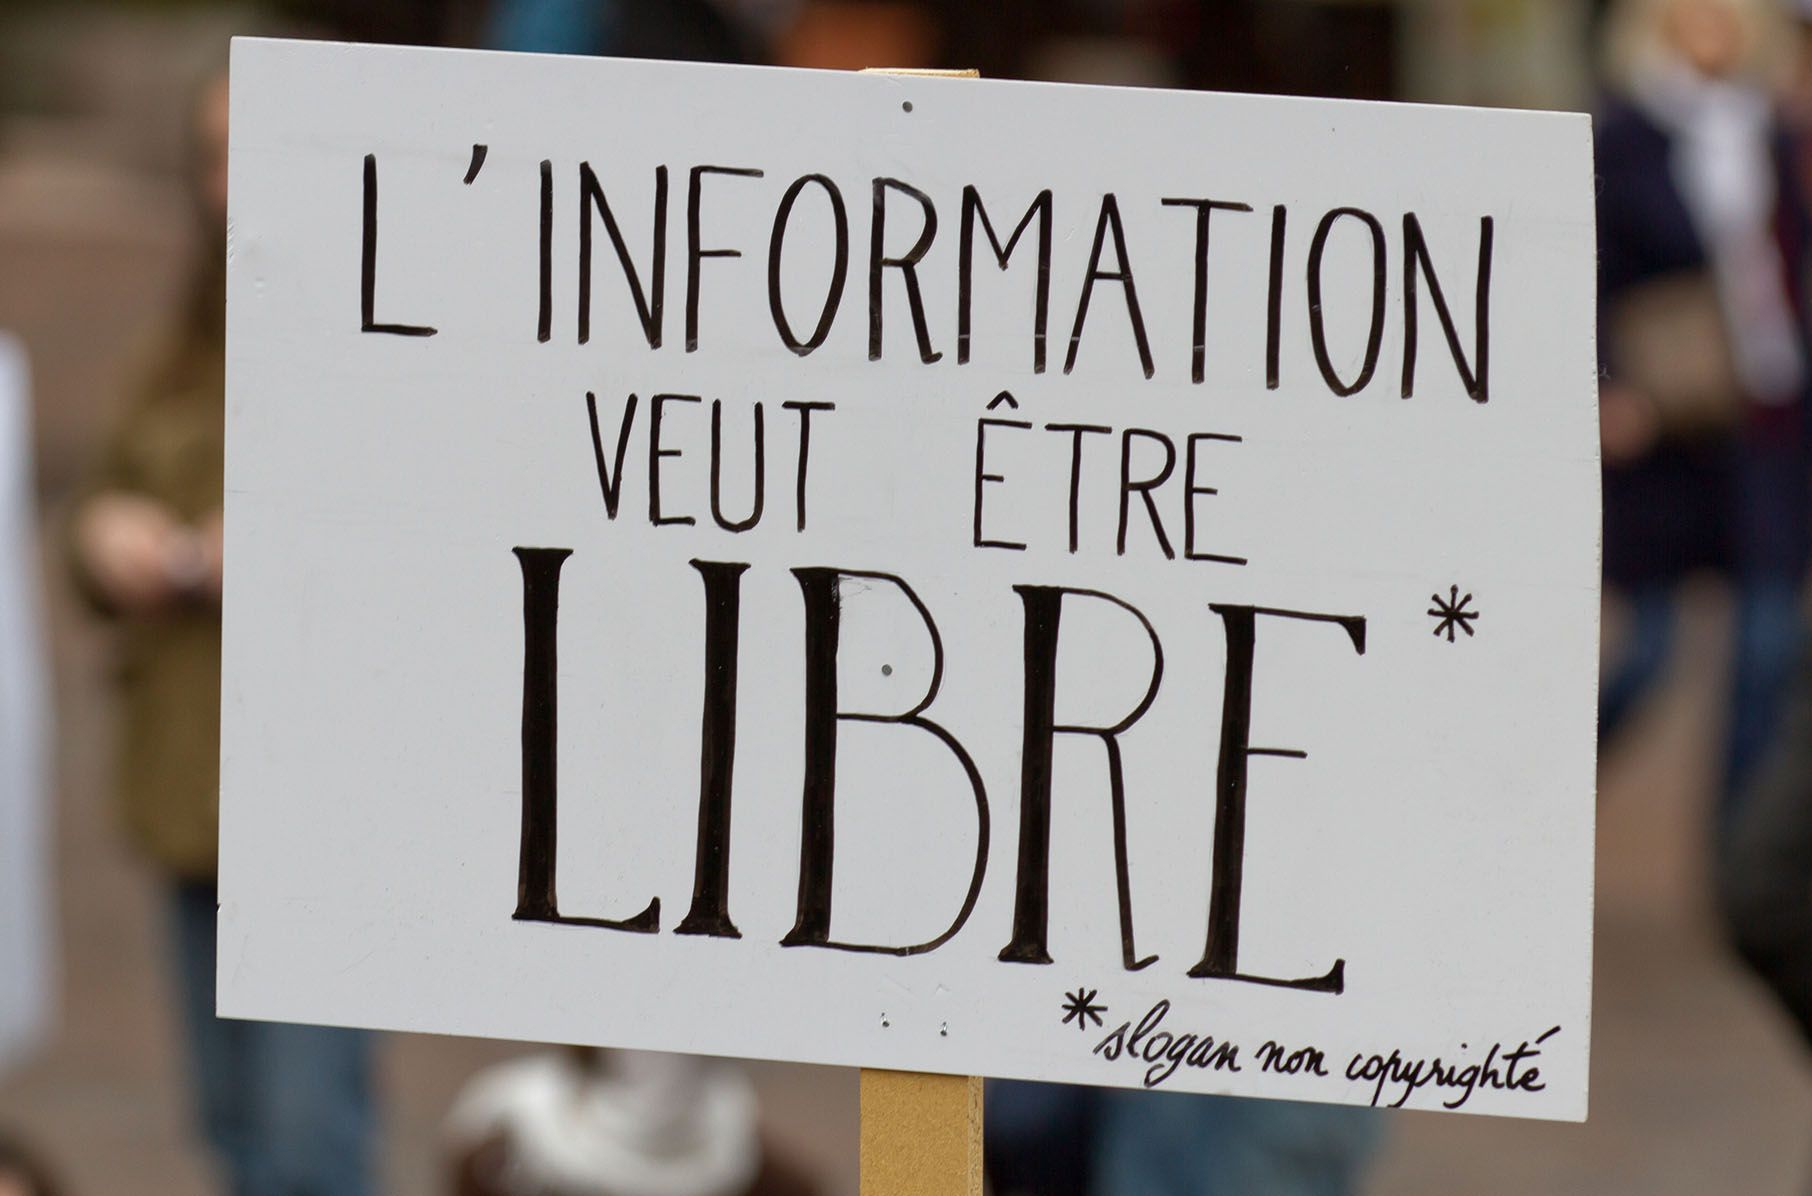 Image via pierre-selim on Flickr Creative Commons